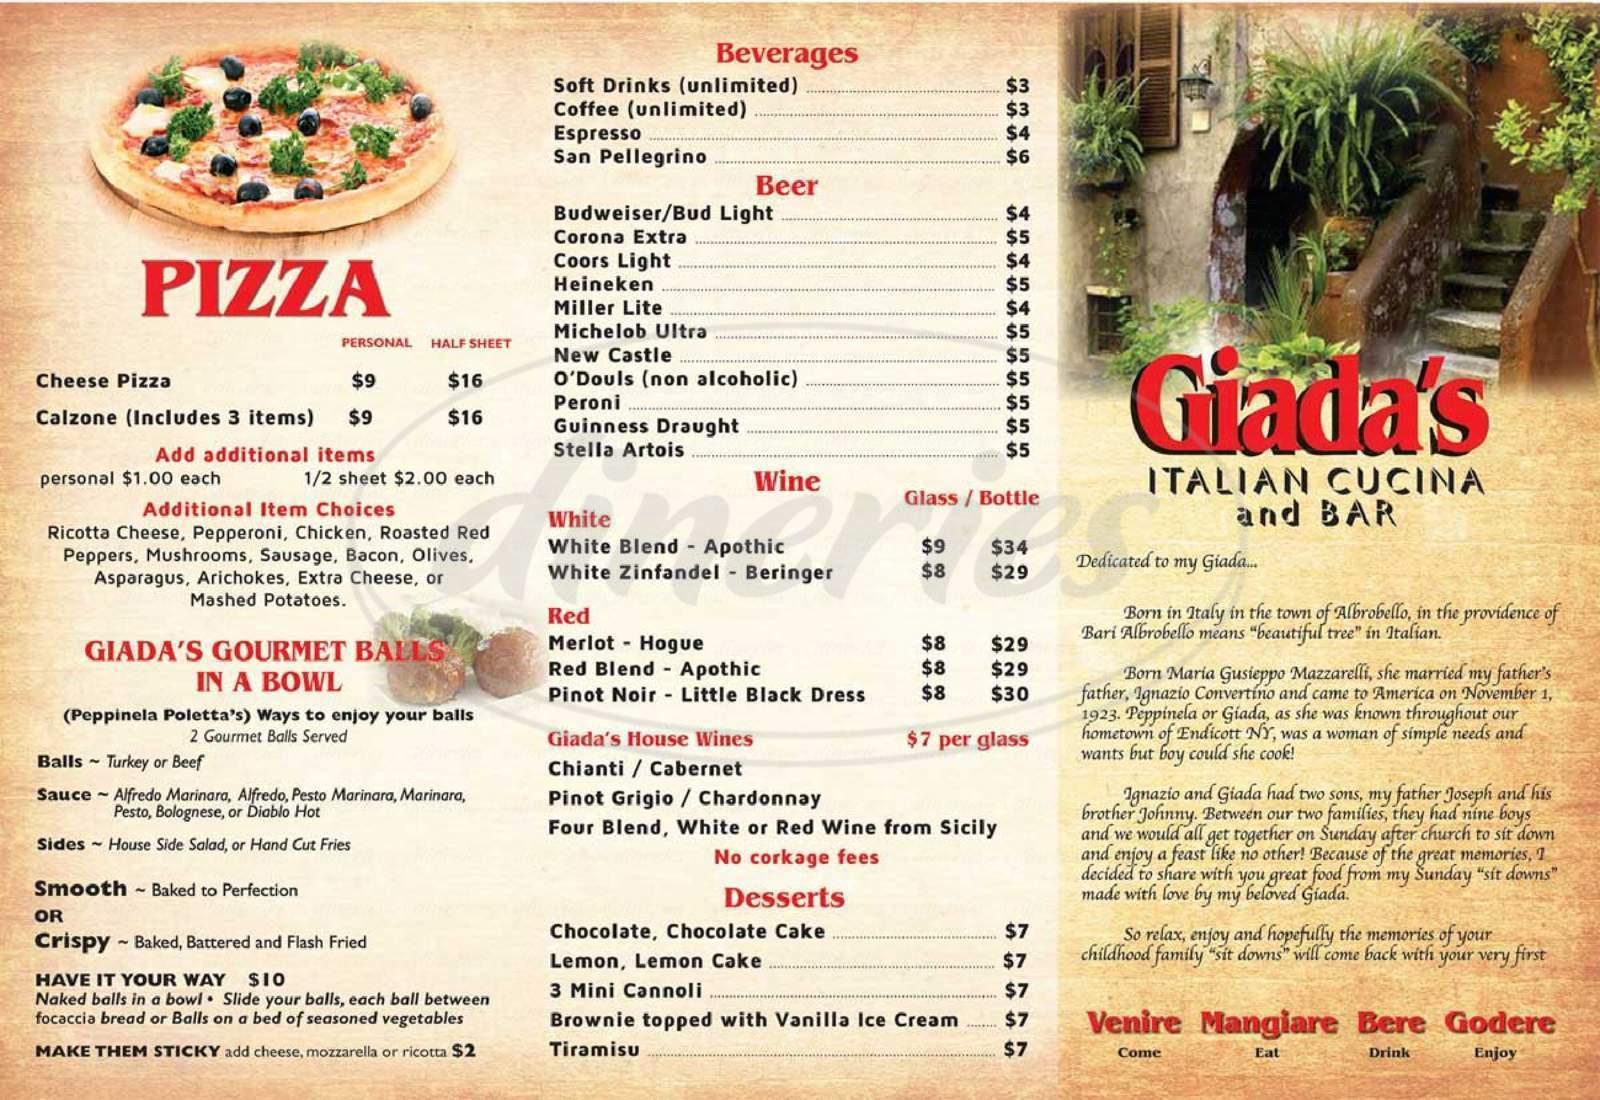 menu for Giada's Italian Cucina